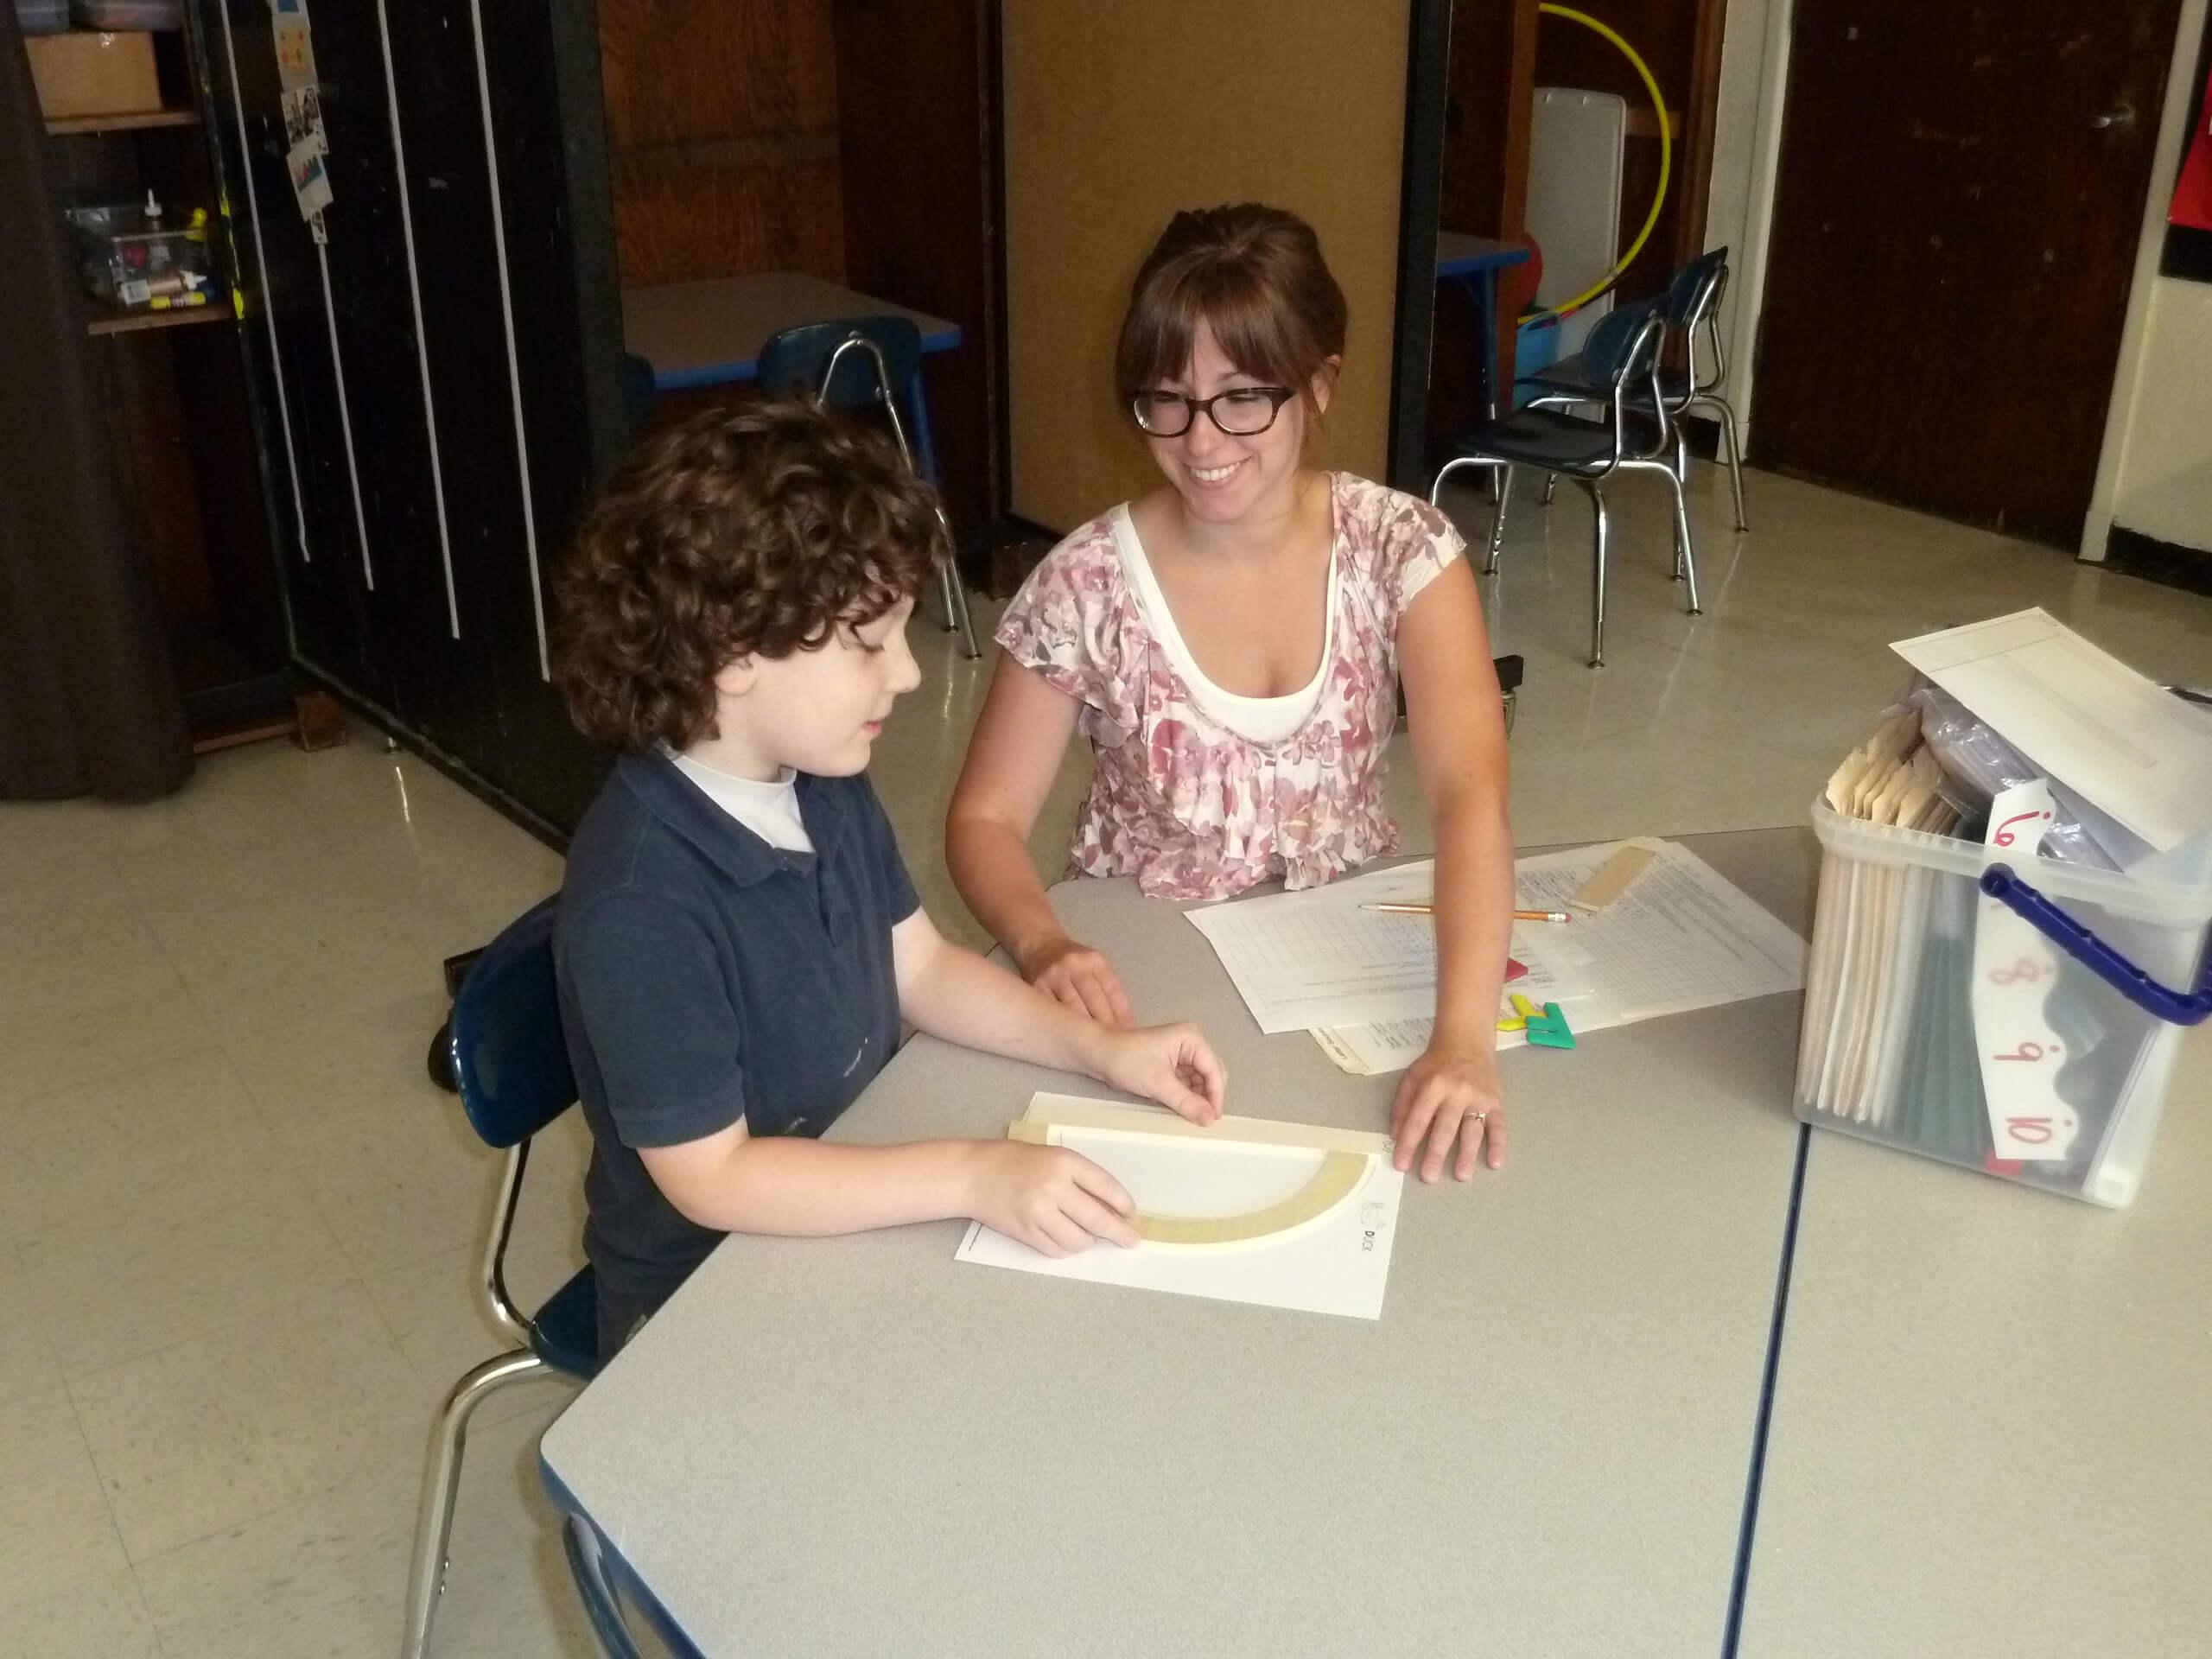 essay on behavior in the classroom